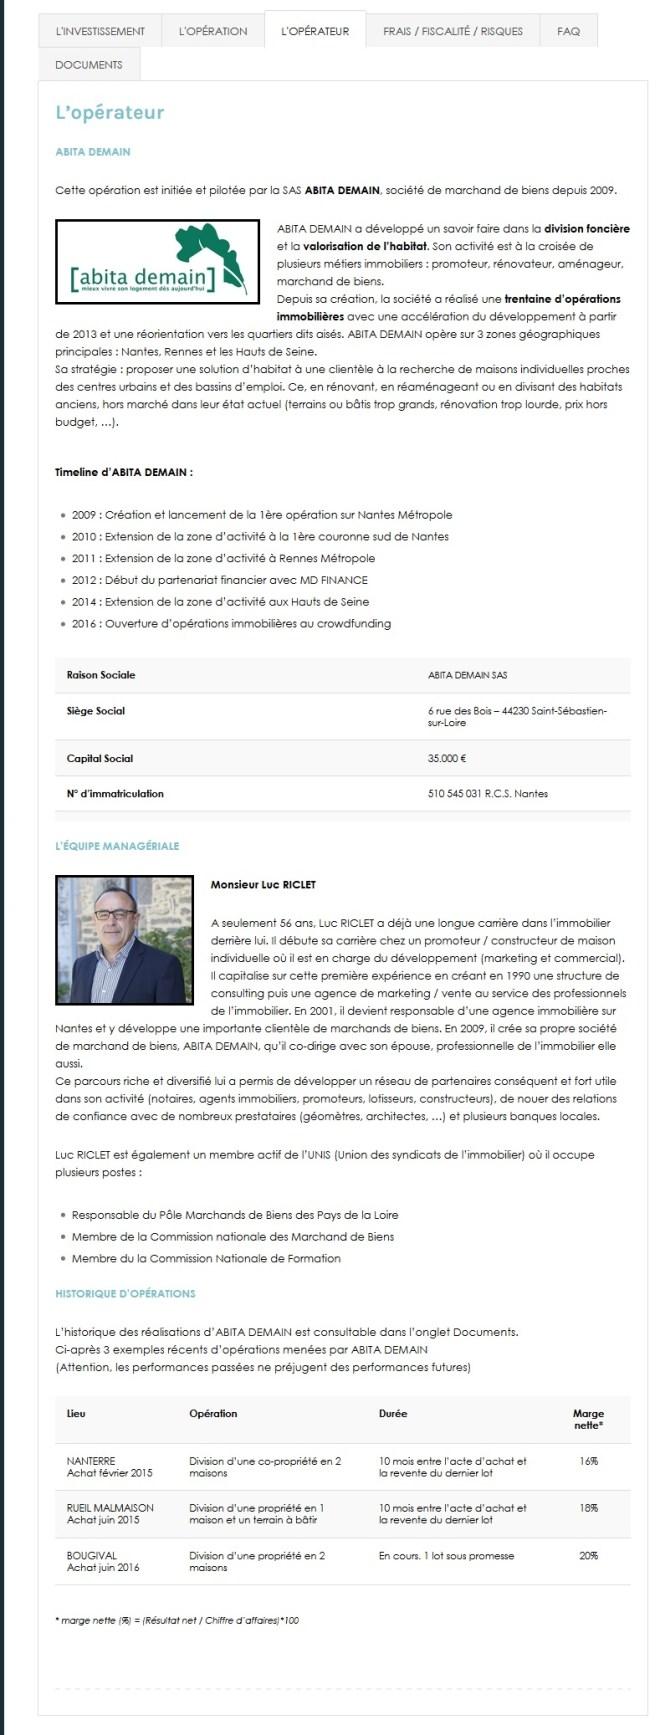 immocratie-crowdfunding-crowdlending-immobilier-projet-05